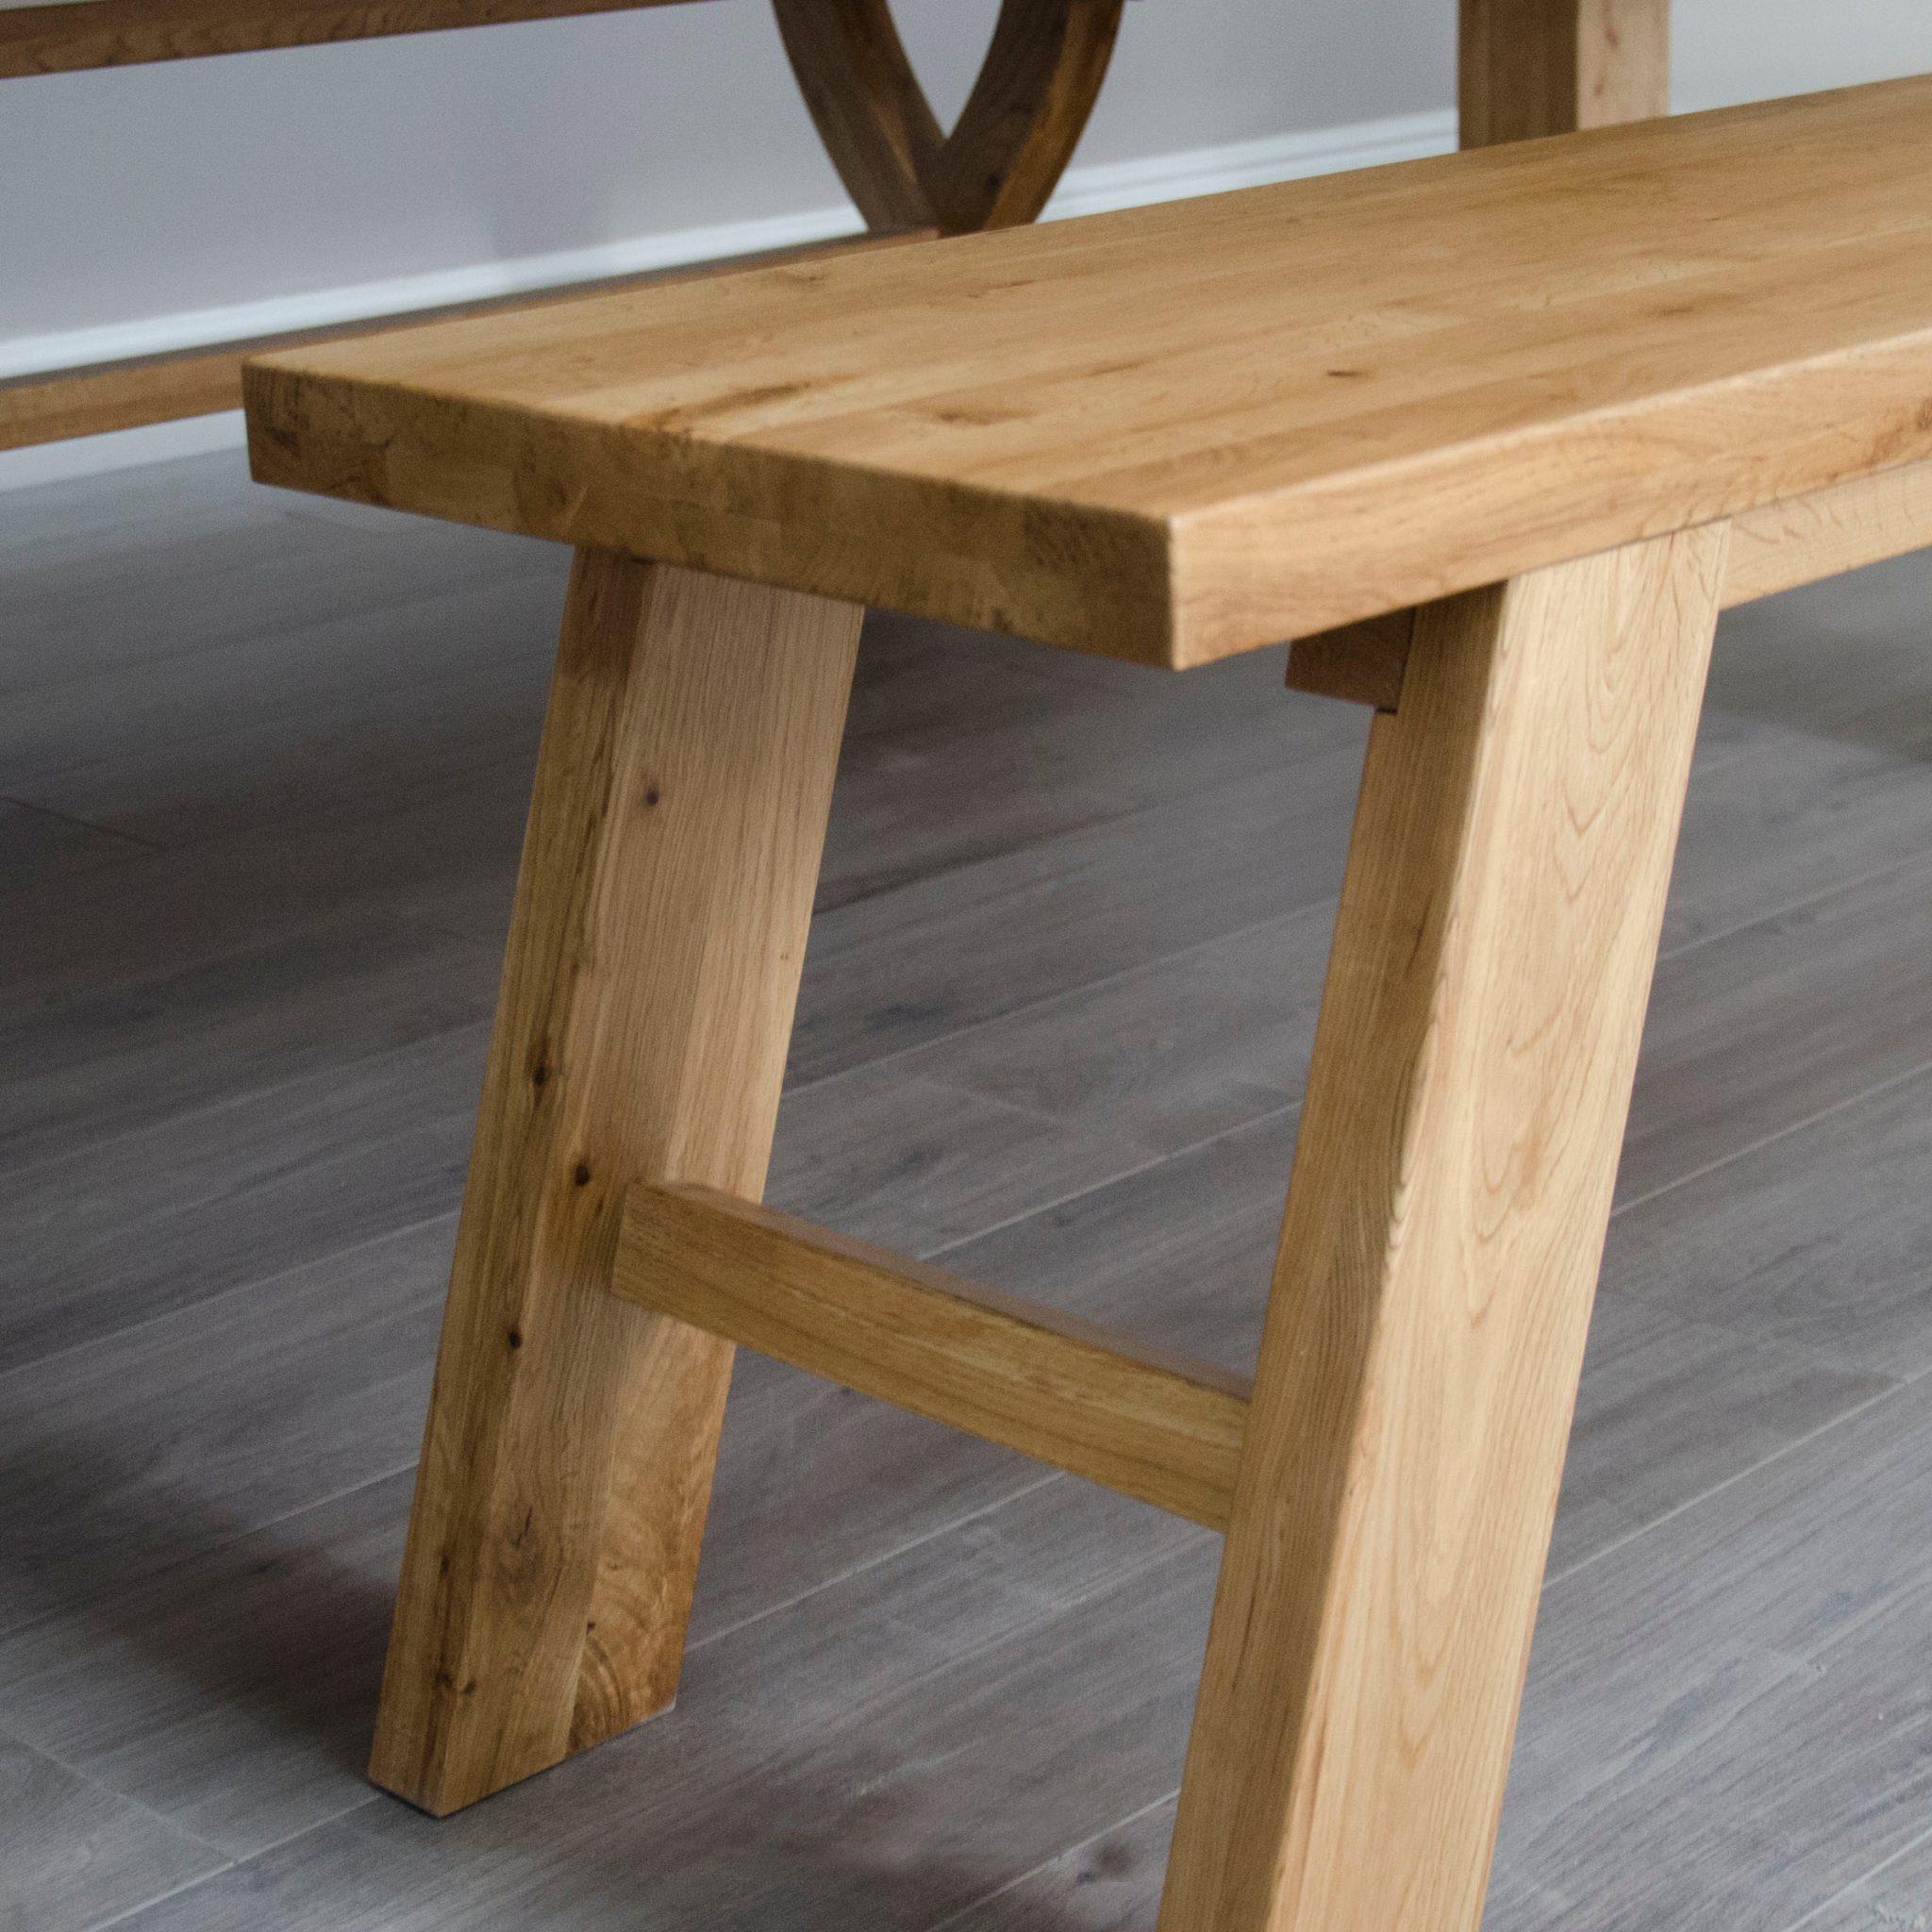 Melford oak slatted style bench